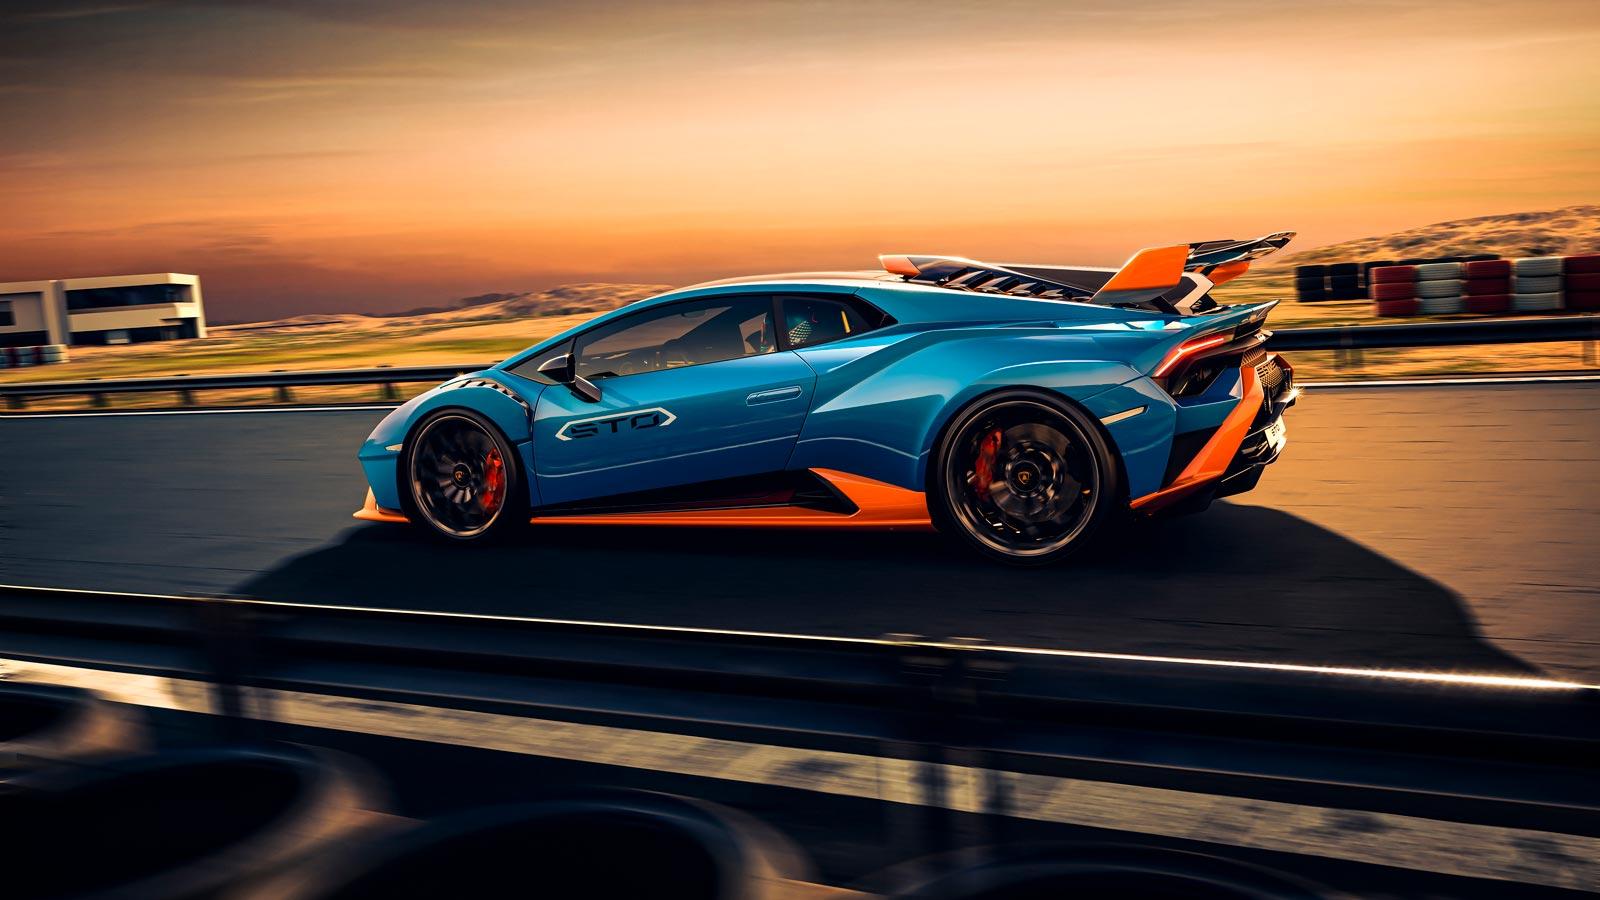 Lamborghini Huracan STO - From racetrack to road image 10